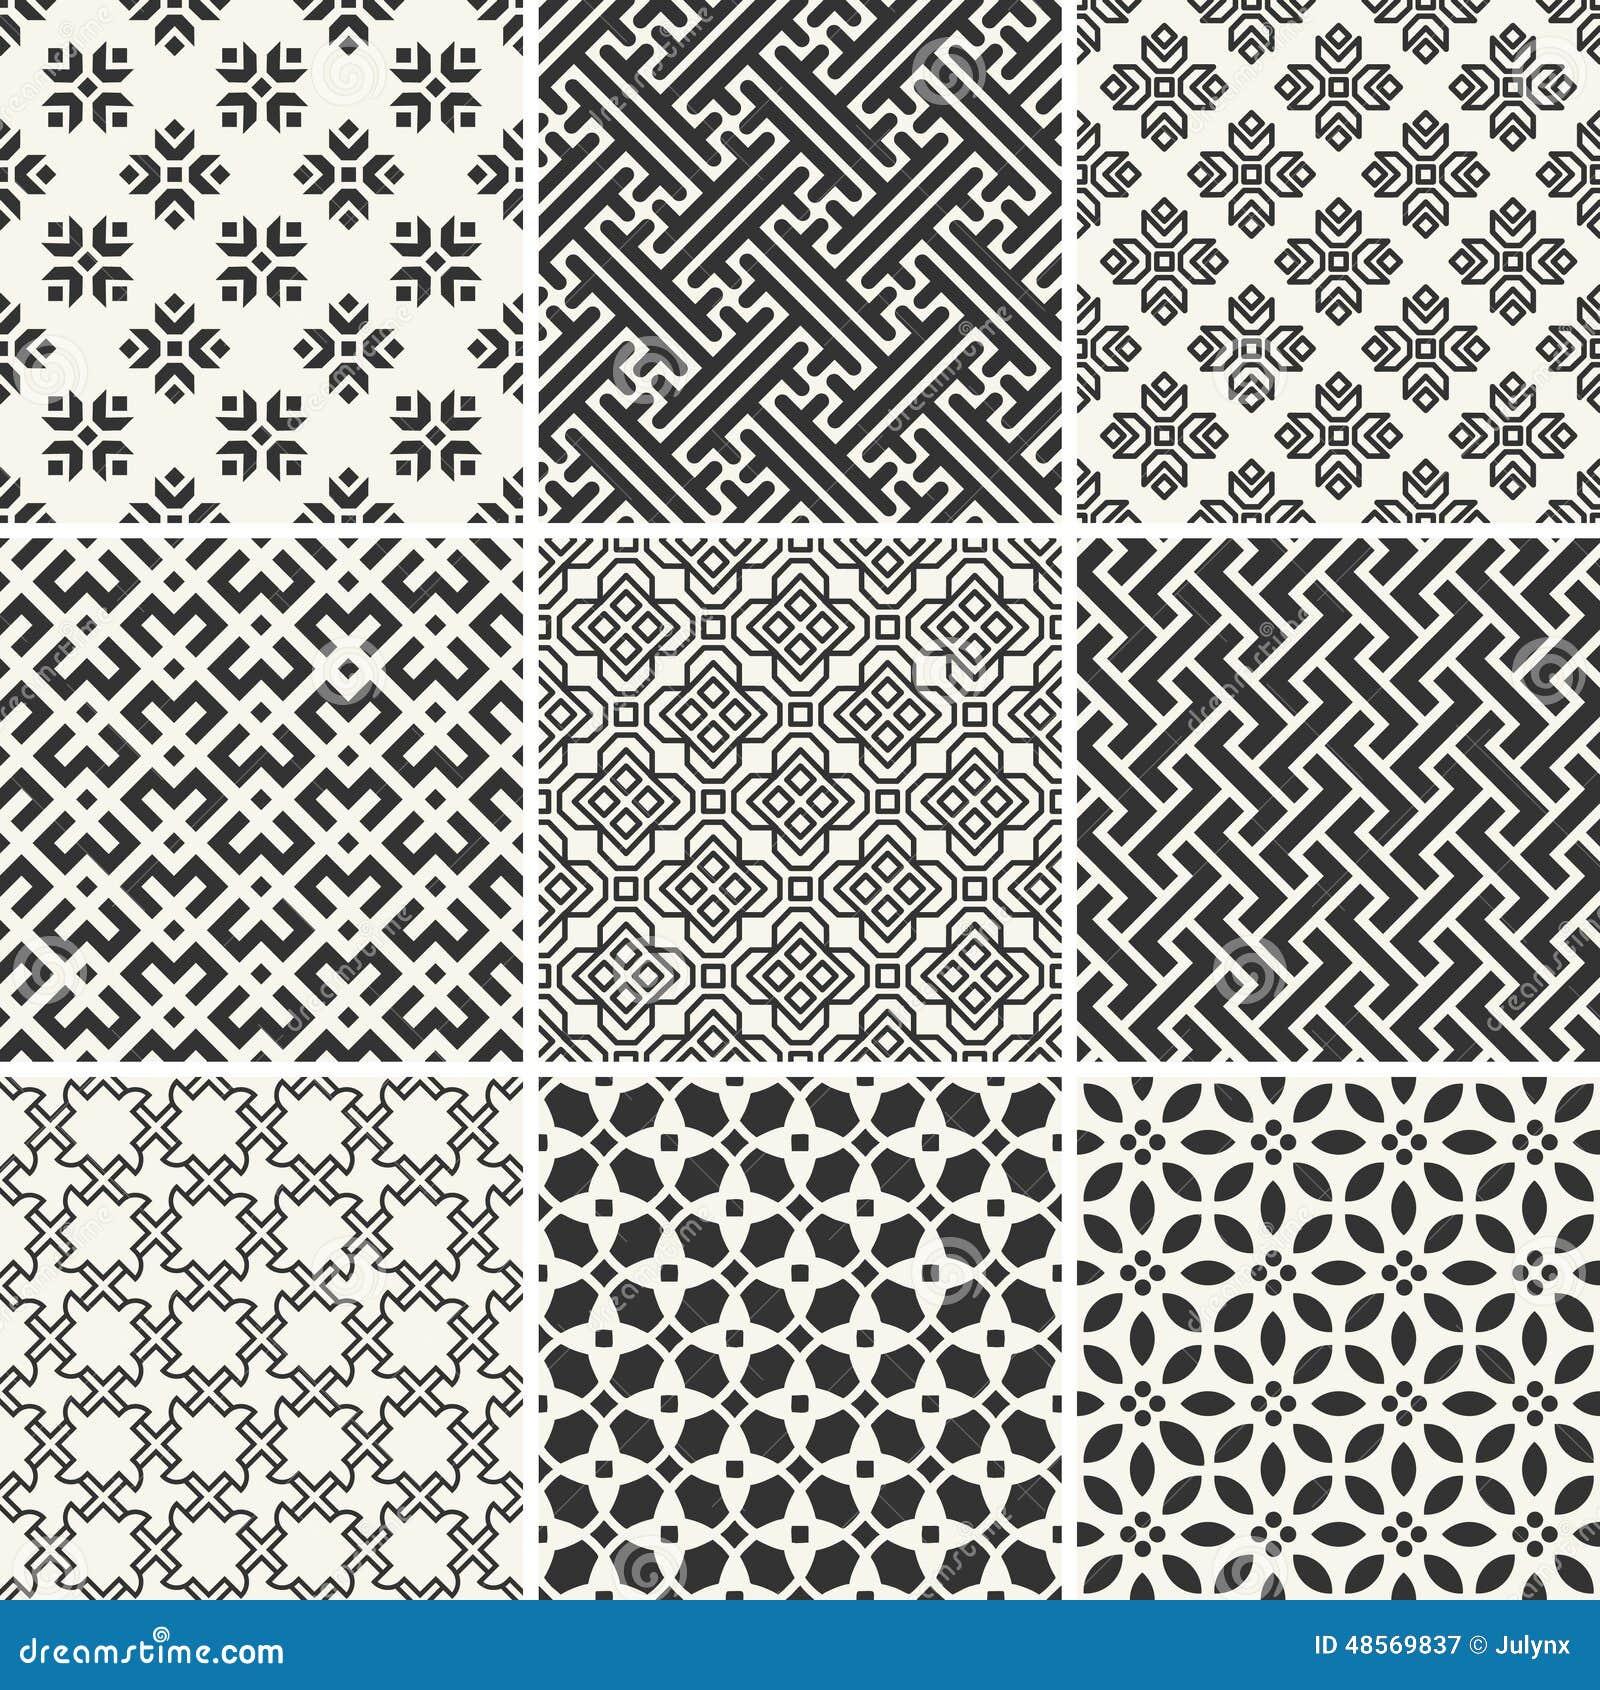 Designs Patterns Using Geometric Shapes